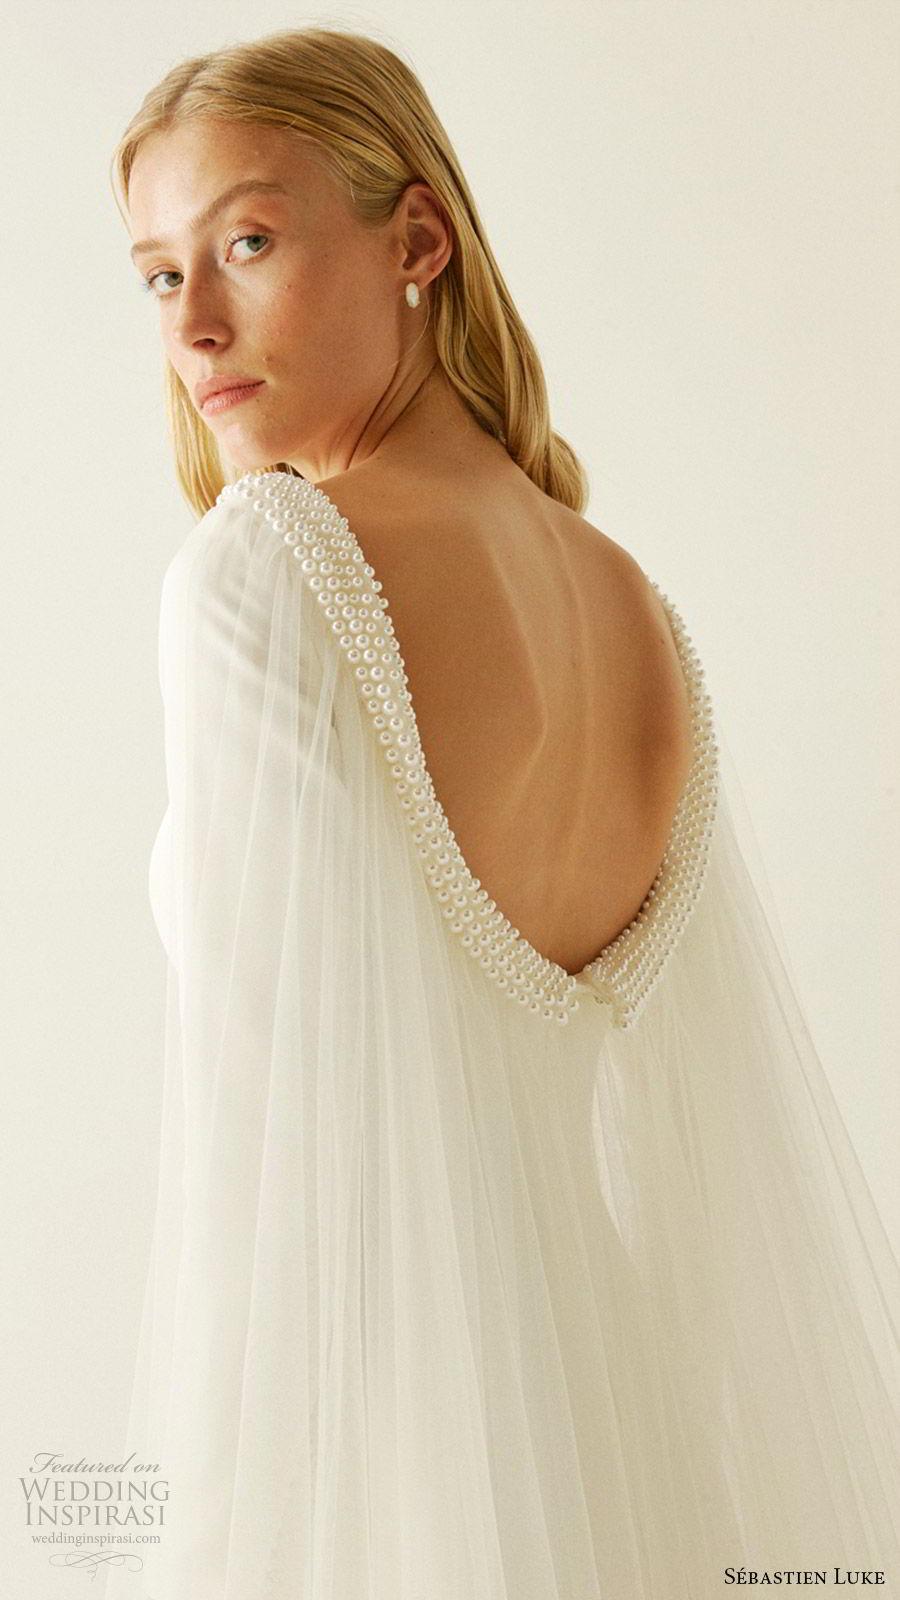 sebastien luke fall 2019 bridal jewel neckline long sleeves minimal embellishment modified a line wedding dress pockets cape clean simple modern (4) zbv